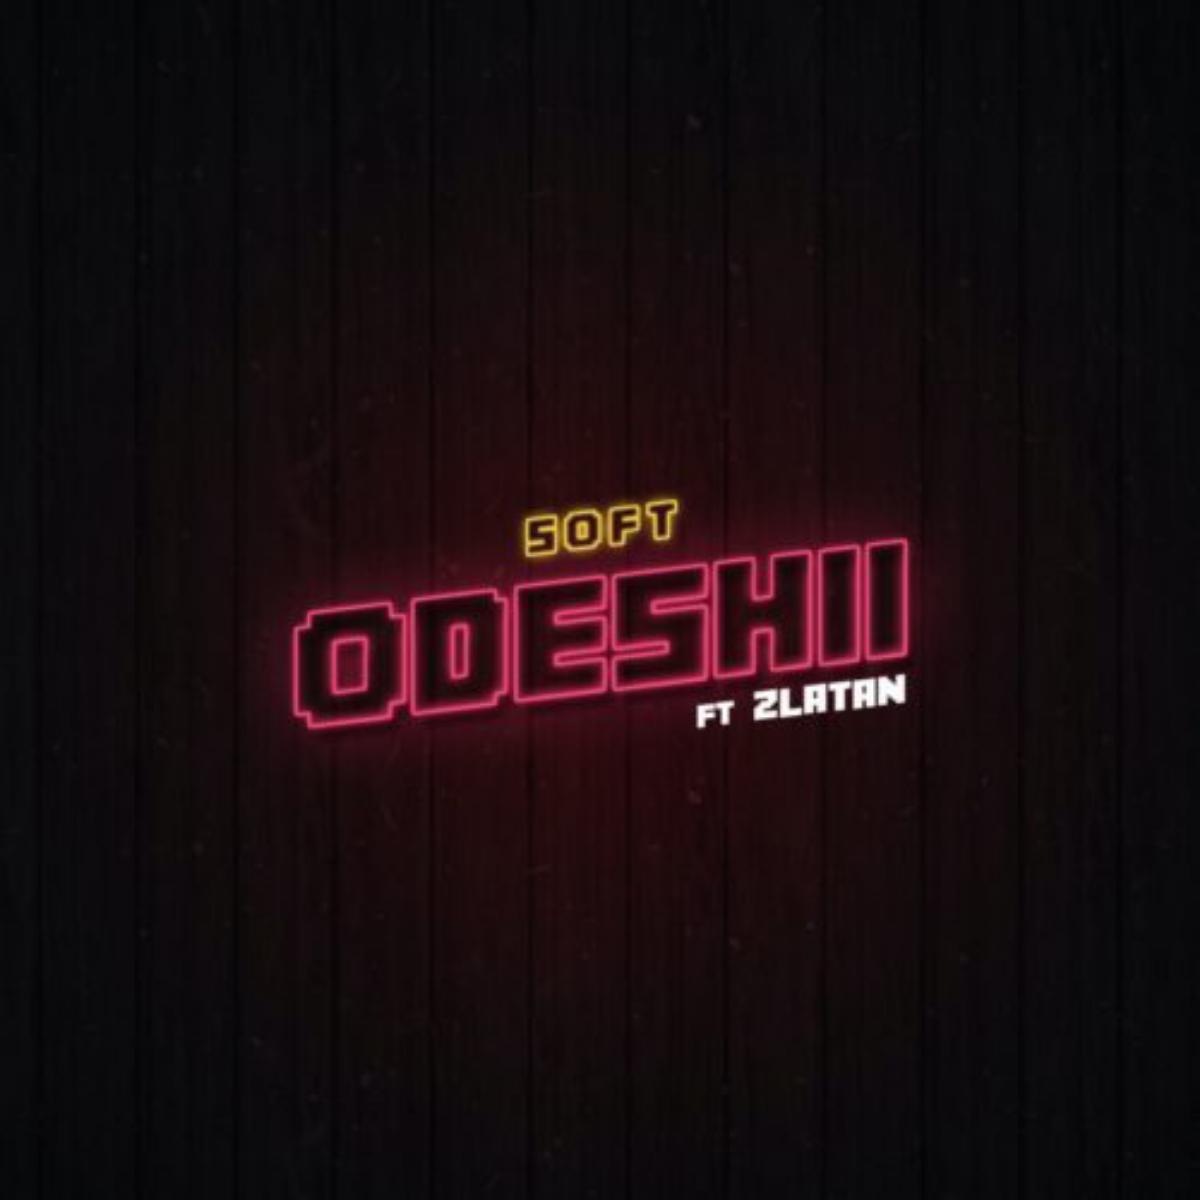 Soft Ft Zlatan – Odeshi 2